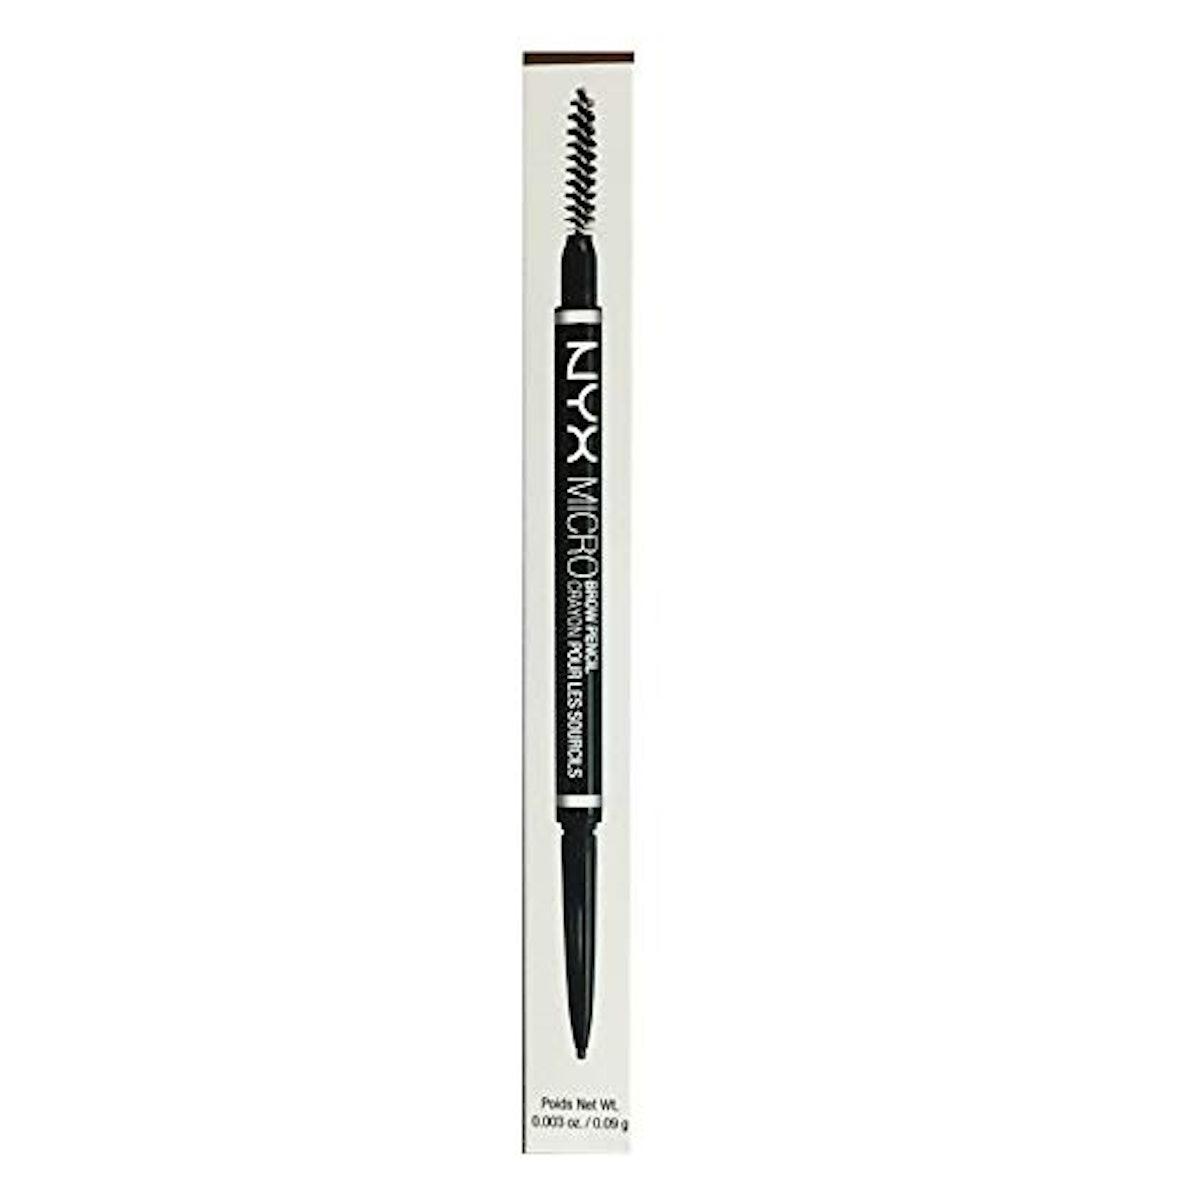 NYX Professional Makeup Micro Brow Pencil